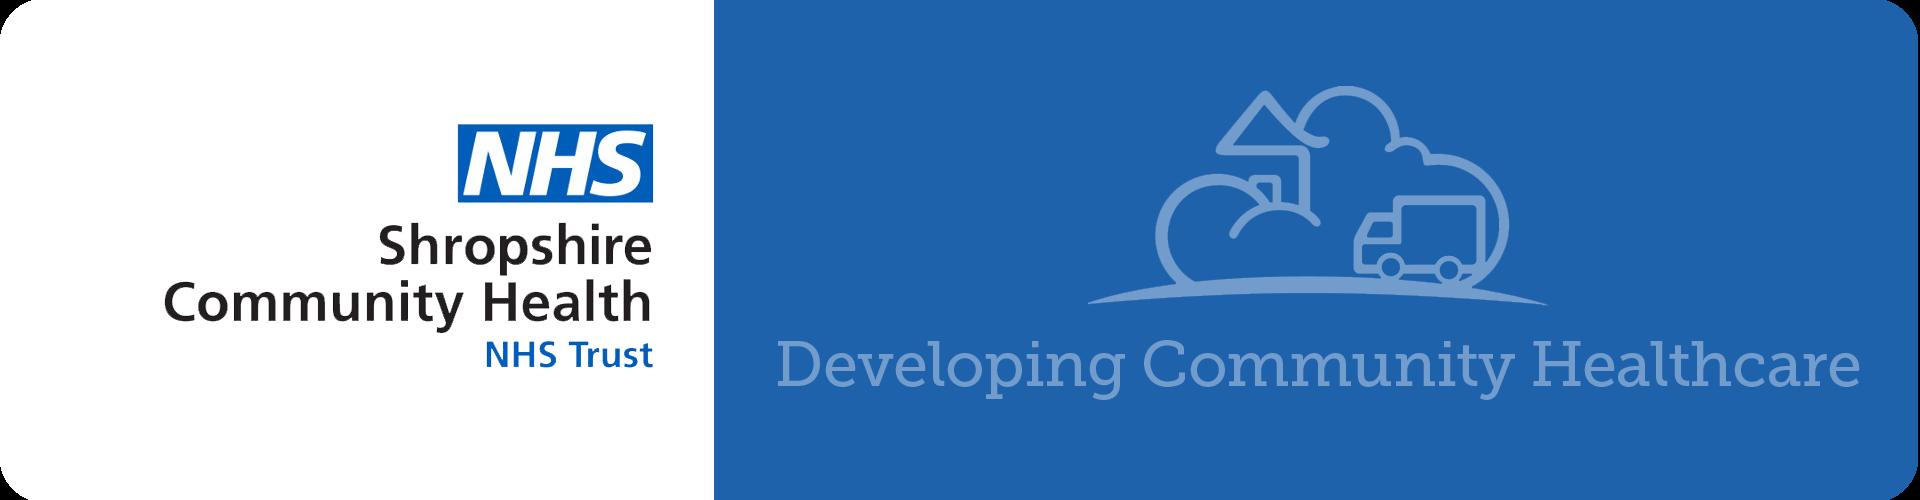 nhs shropshire community health logo